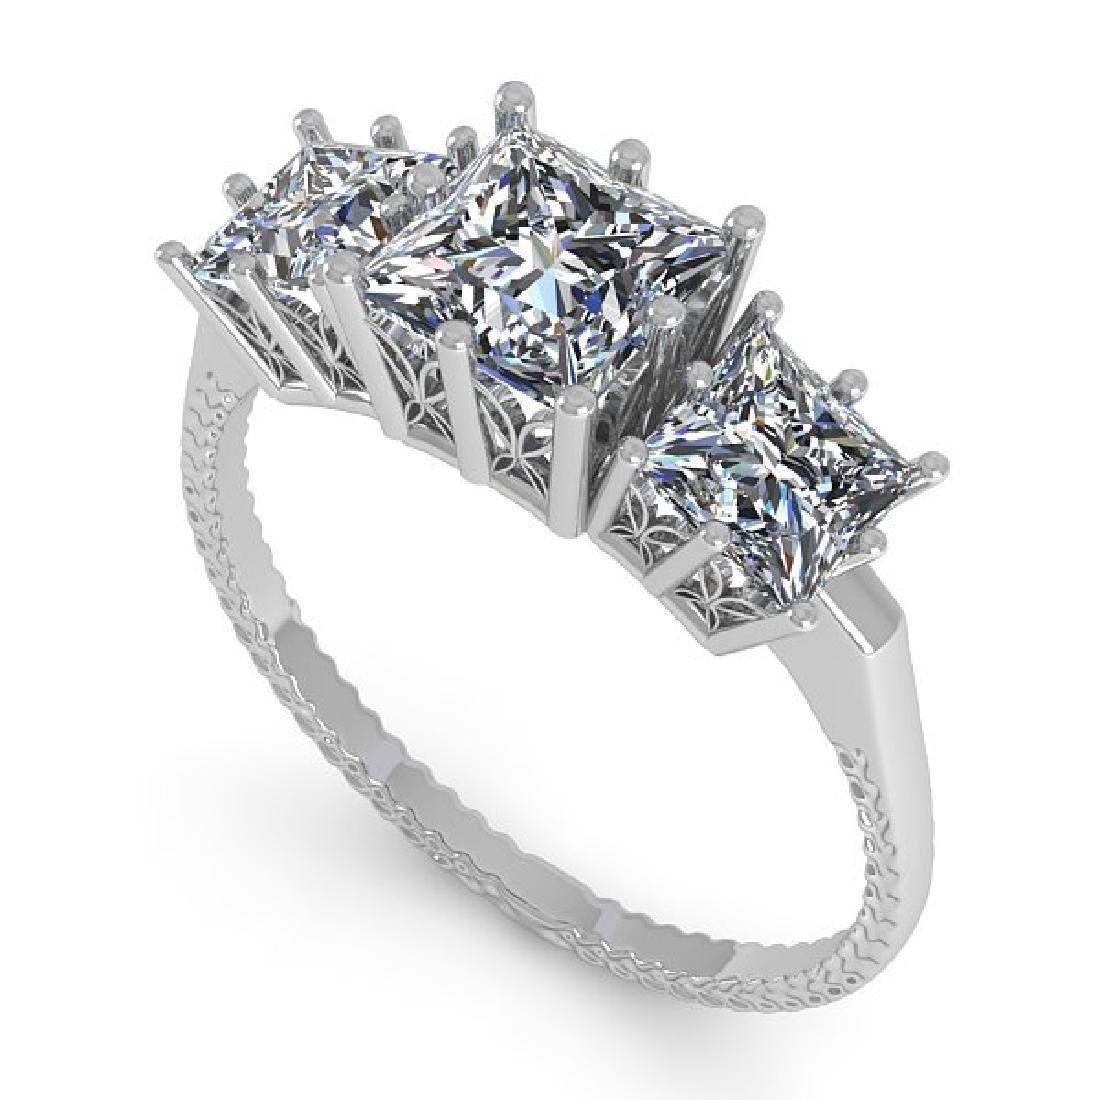 2.0 CTW VS/SI Princess Diamond Art Deco Ring 14K White - 2